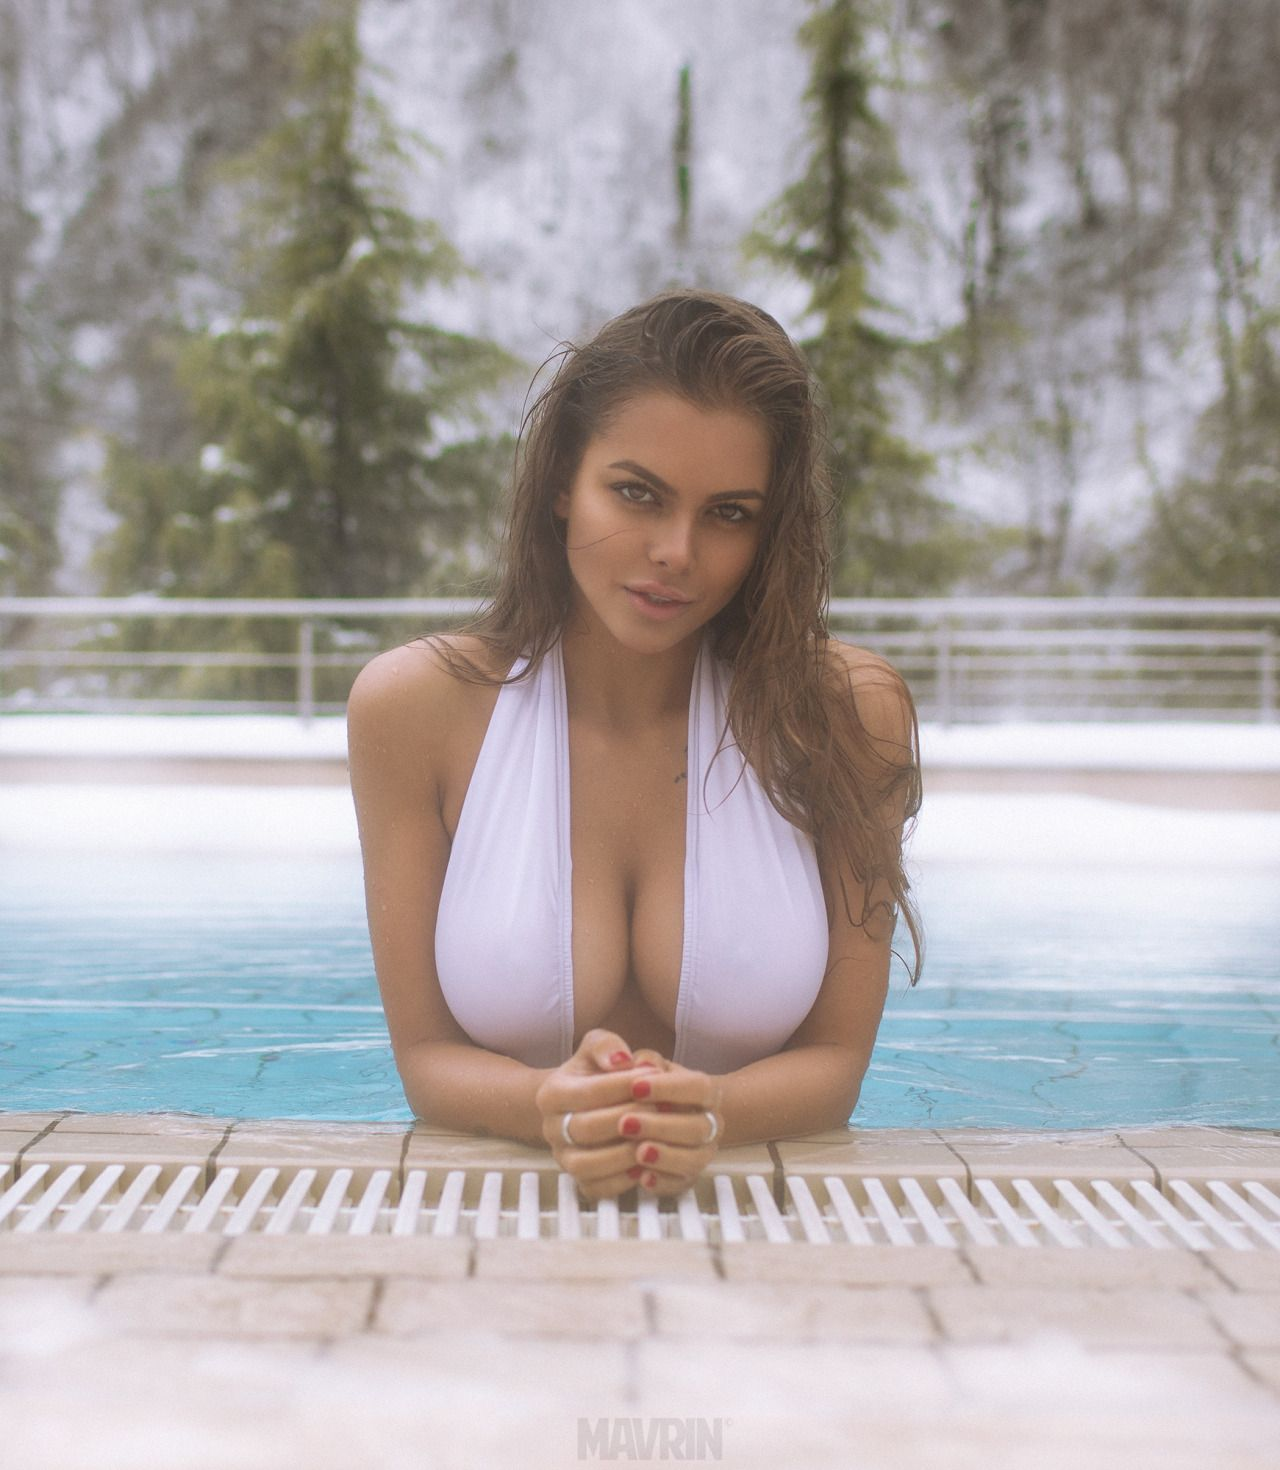 Viktoria Odintcova nudes (35 pictures), Is a cute Erotica, Twitter, butt 2018